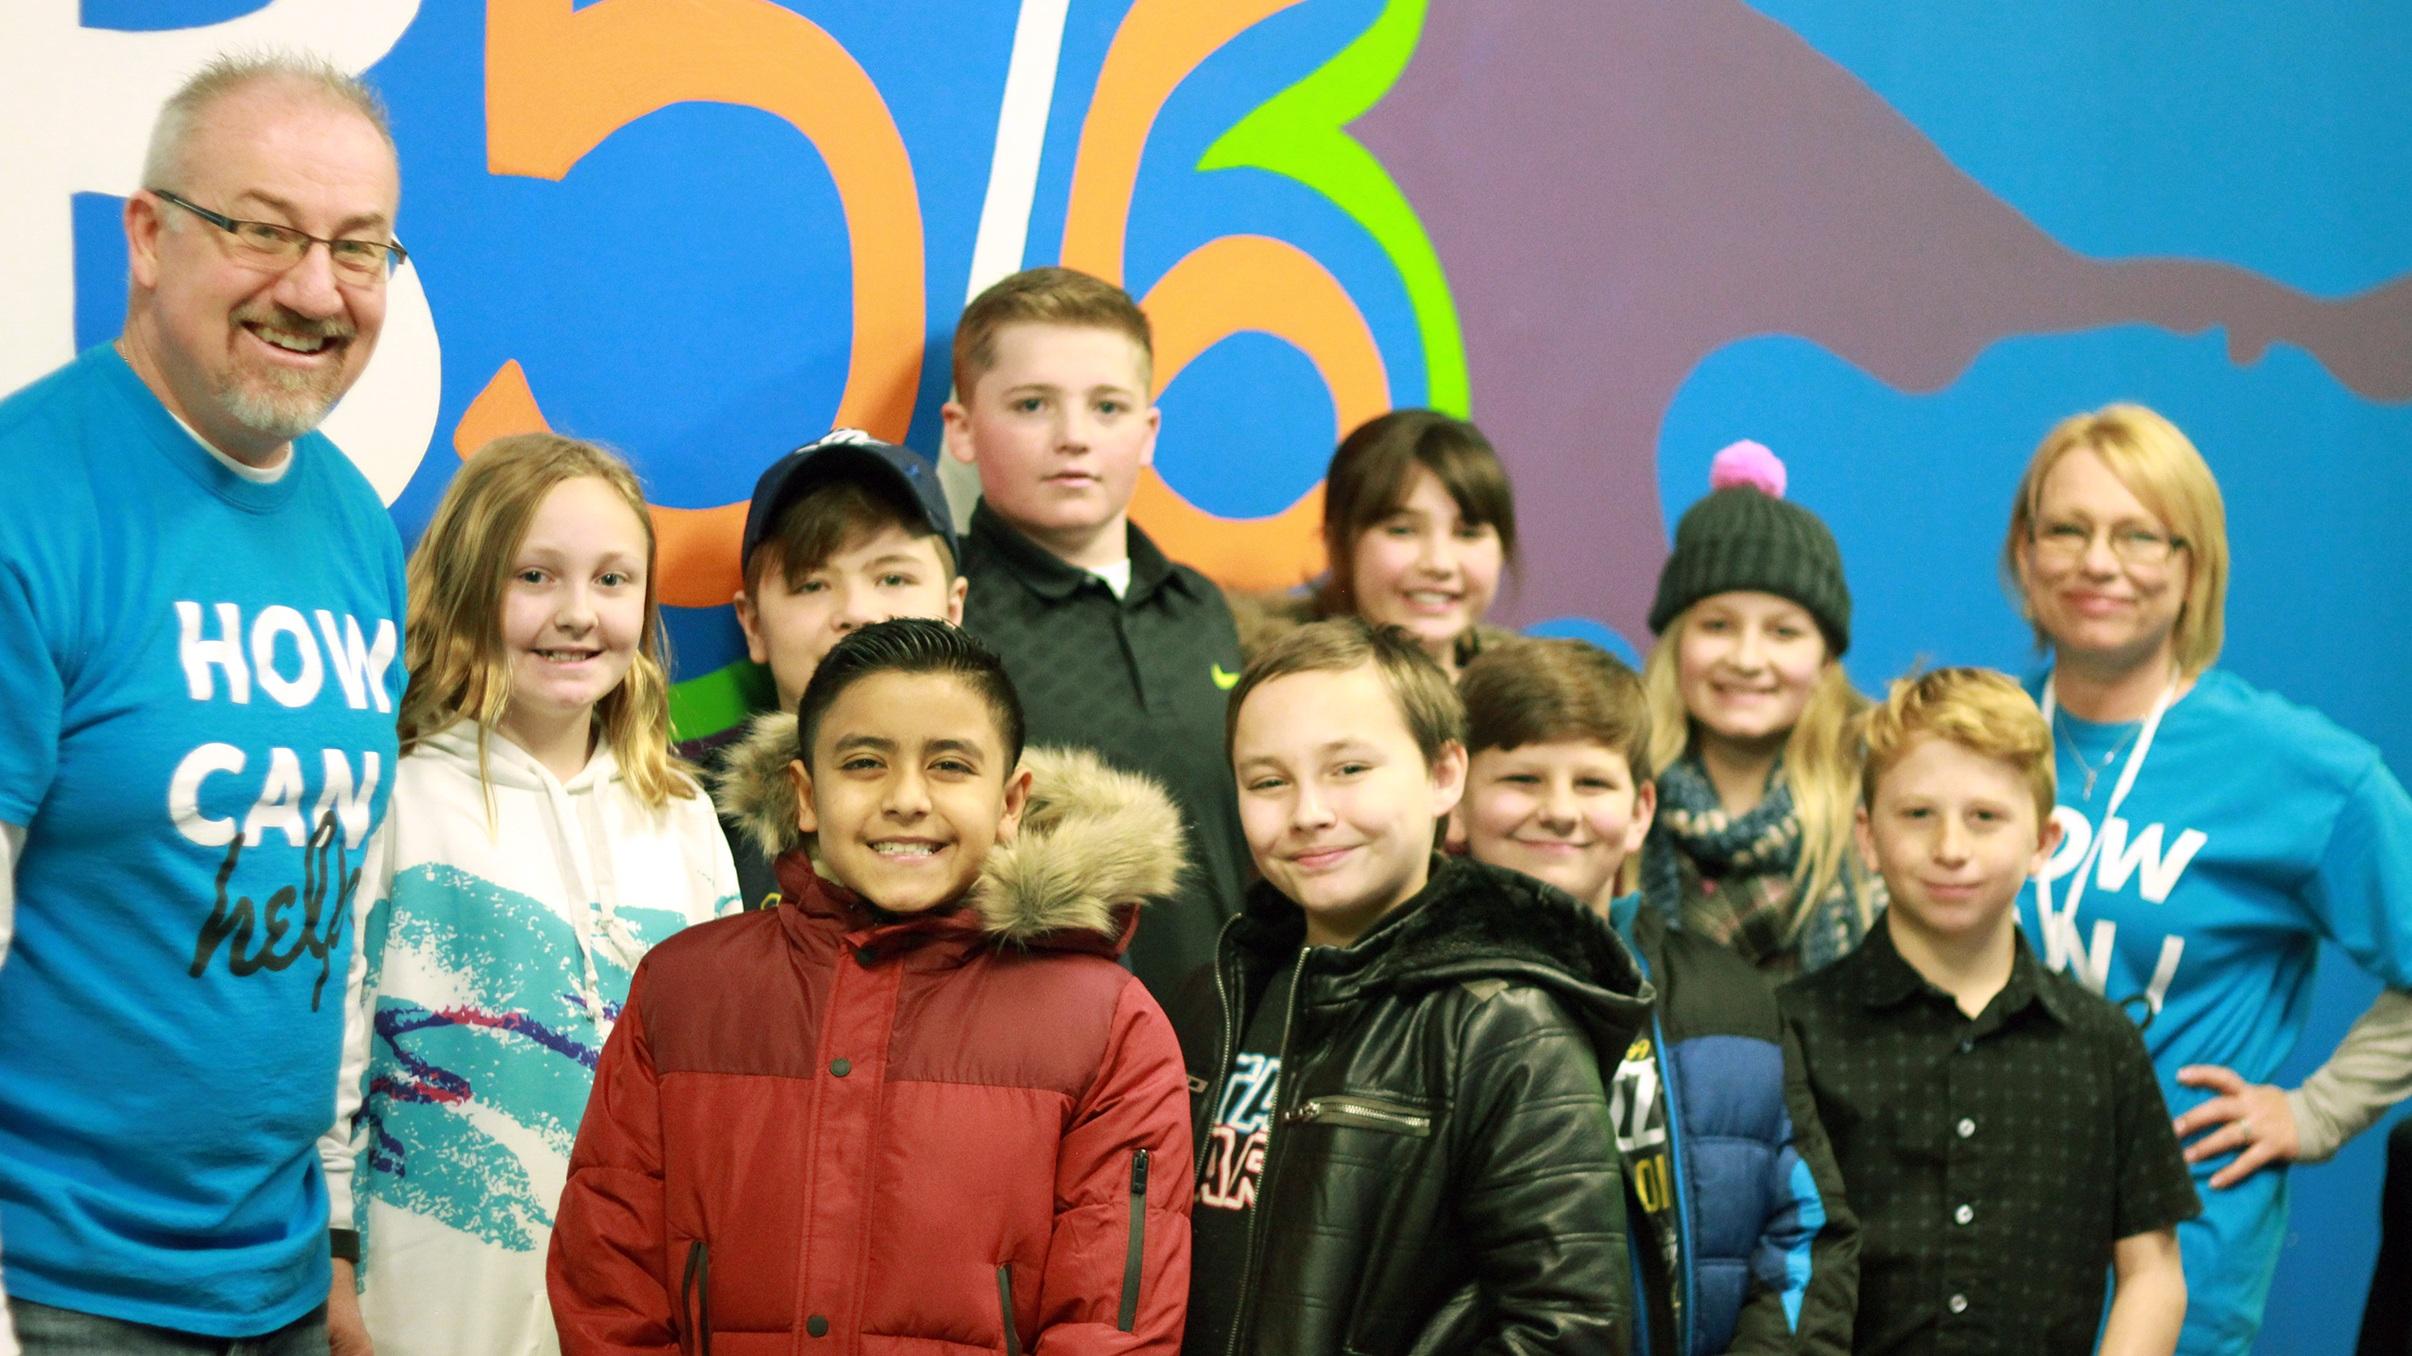 Club 565th & 6th Grades -